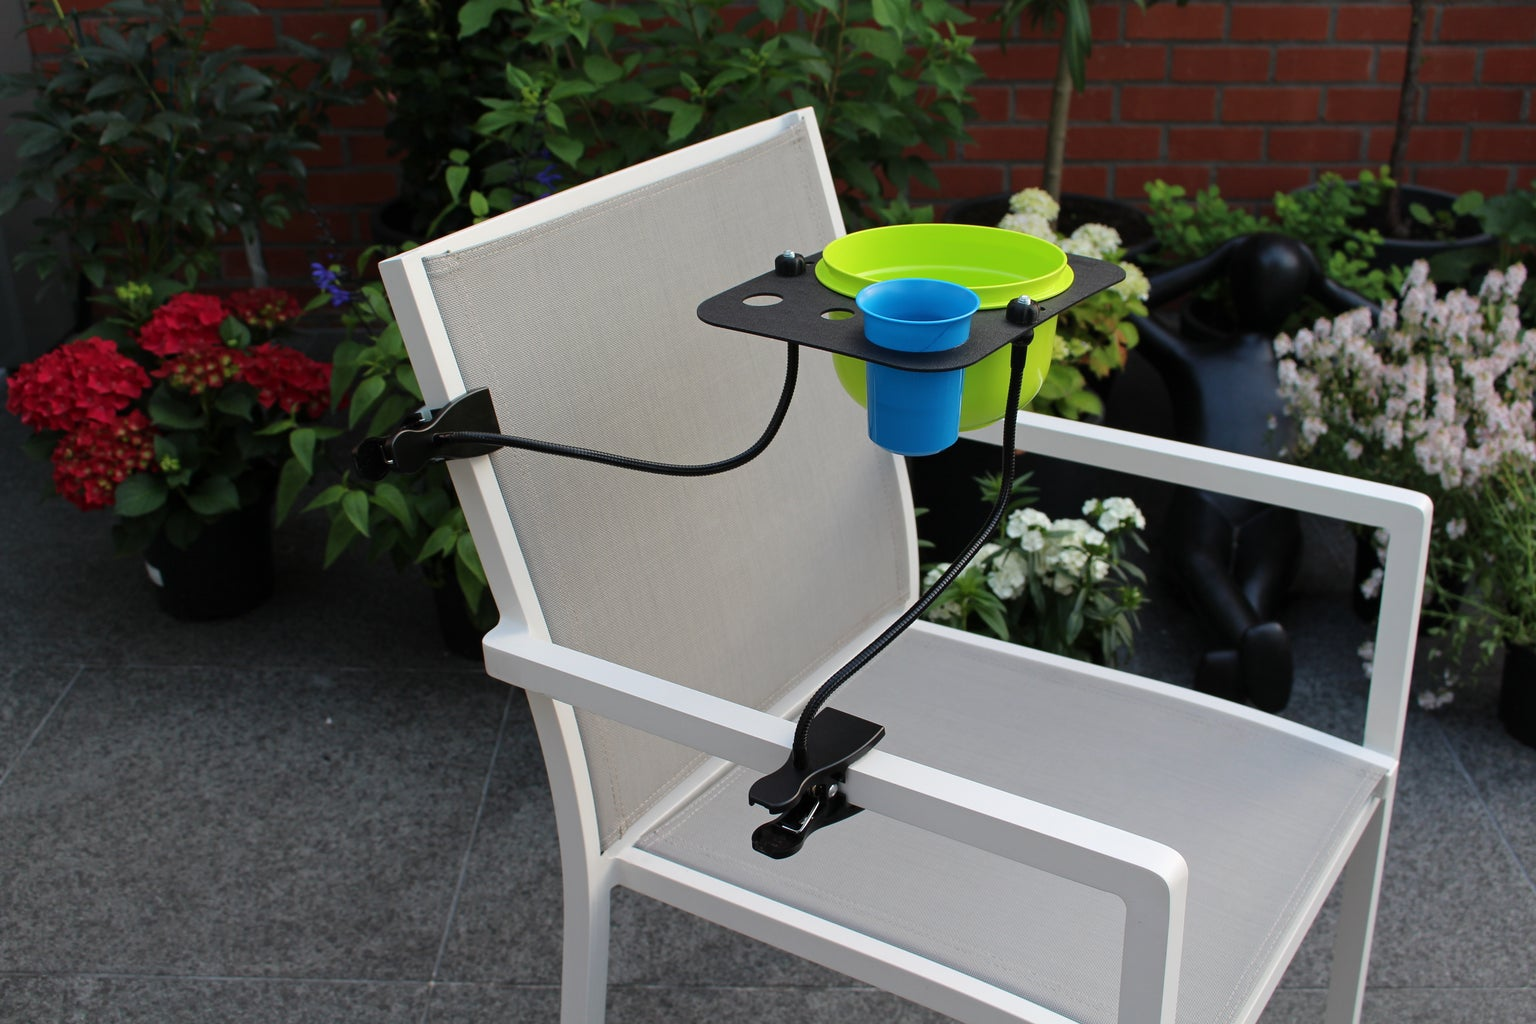 D4E1 - DIY -  Assistive Technology: Adjustable Wheelchair Tray